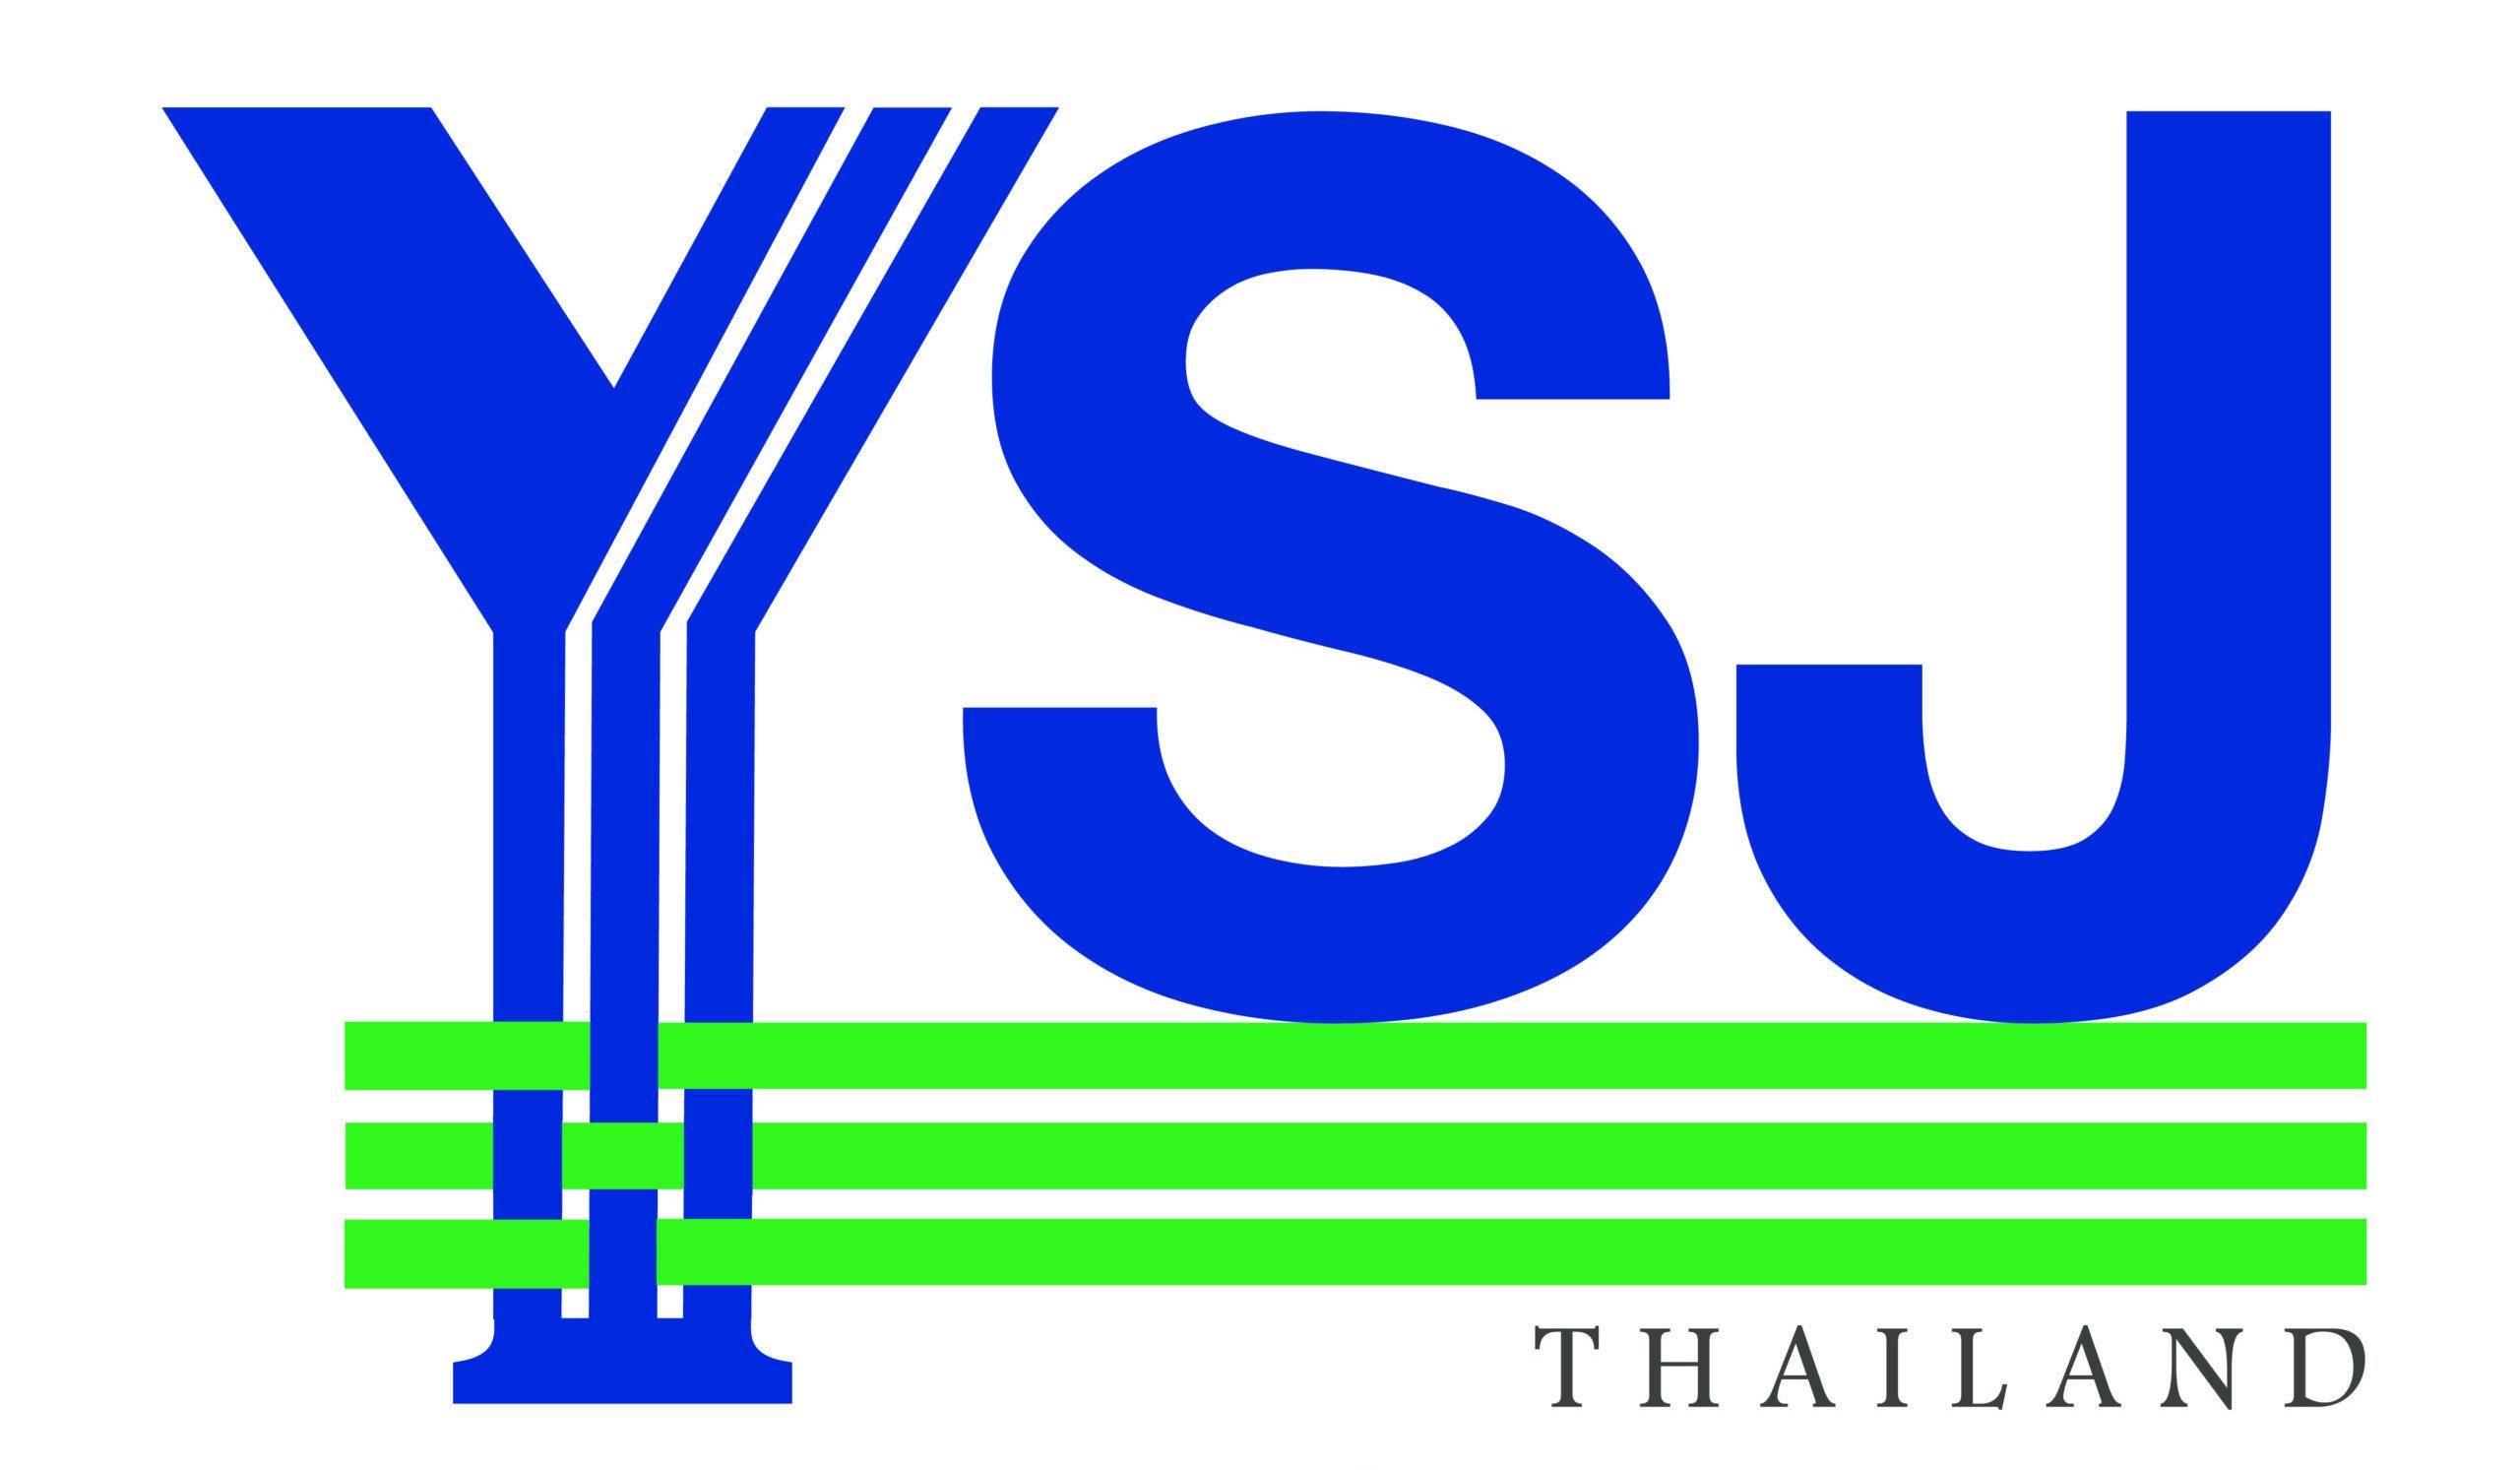 YSJ MAT ผู้ผลิตและจำหน่ายเสื่อทอพลาสติกทุกประเภท